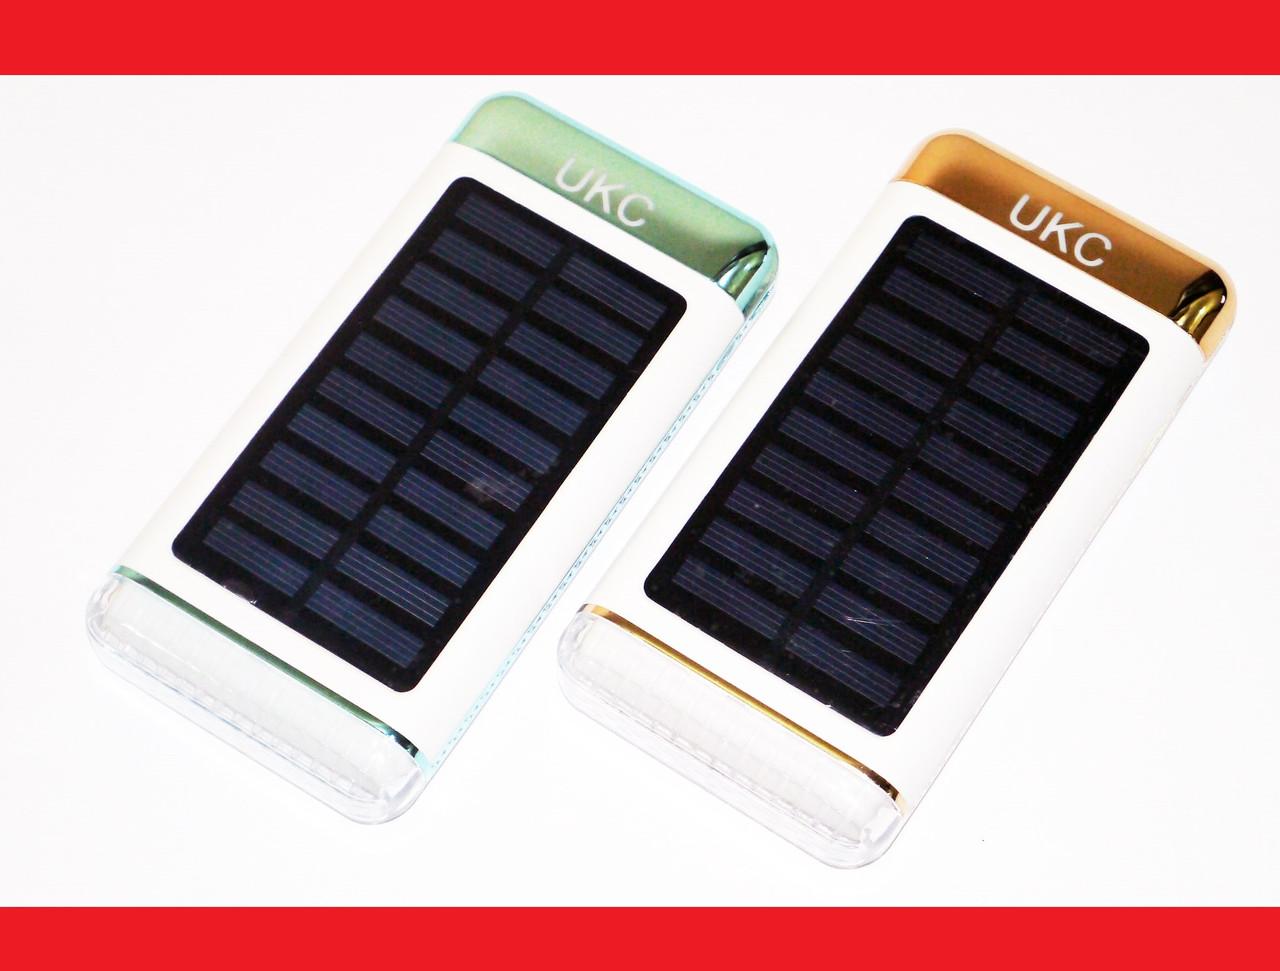 Power Bank UKC 15000mAh с солнечной батареей 3xUSB LED фонарь Глянец